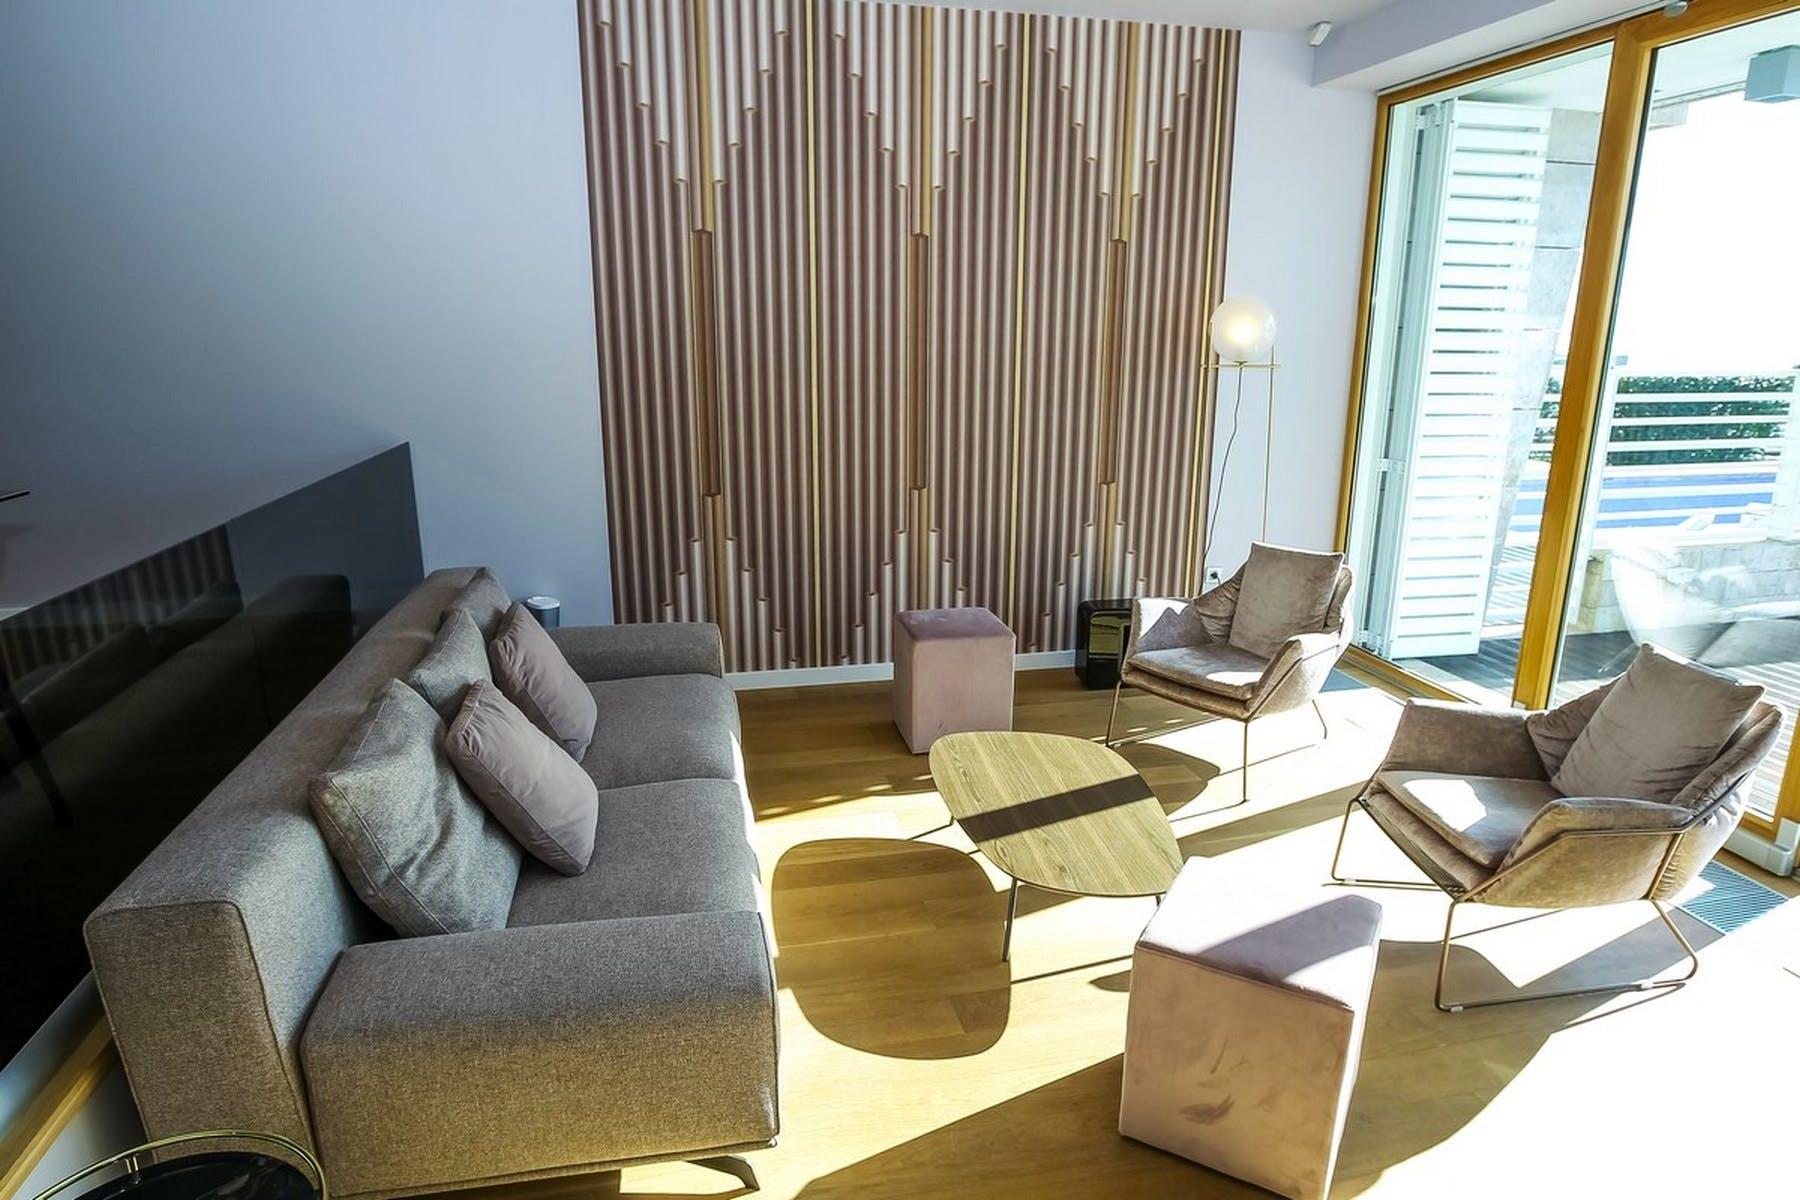 Comfortable sofa and chairs